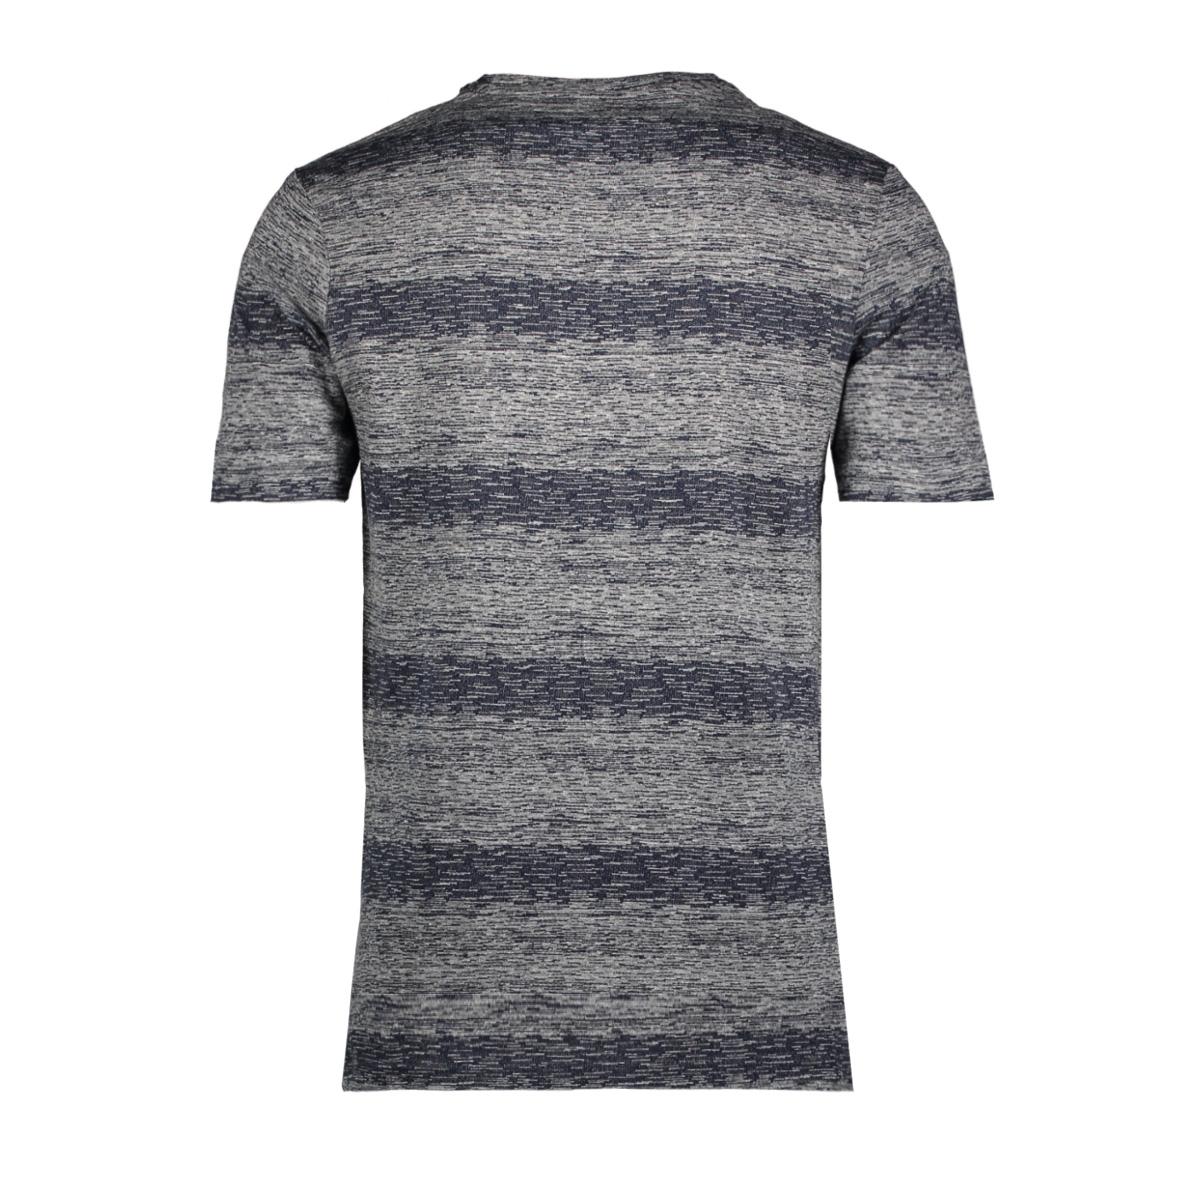 onsmadison ss slim fishtale tee 22007897 only & sons t-shirt dress blues